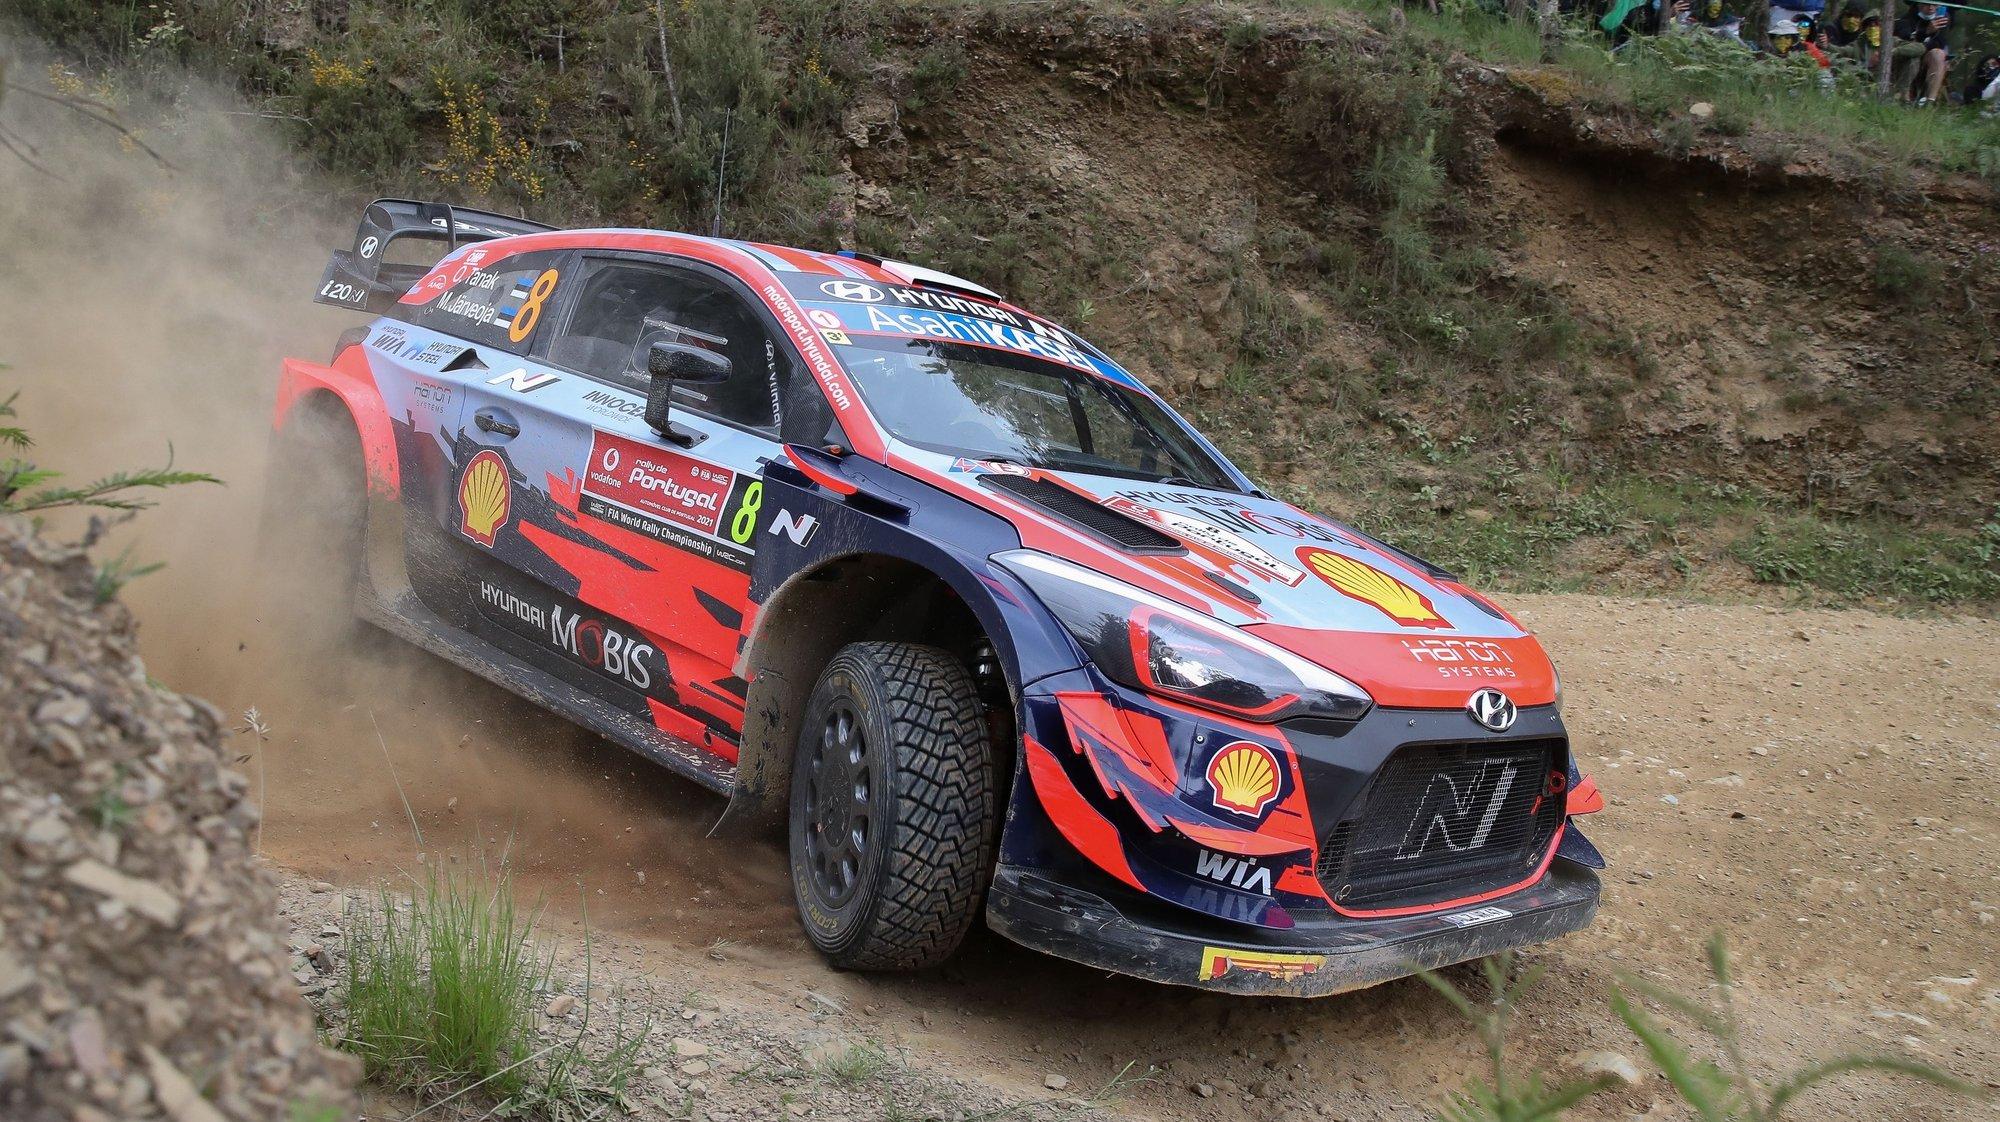 Ott Tanak of Estonia drives his Hyundai i20 coupe WRC during day1, SS4 - Lousa 2, of the Portugal Rally 2021, Lousã, Portugal, 21 May 2021. PAULO NOVAIS/LUSA